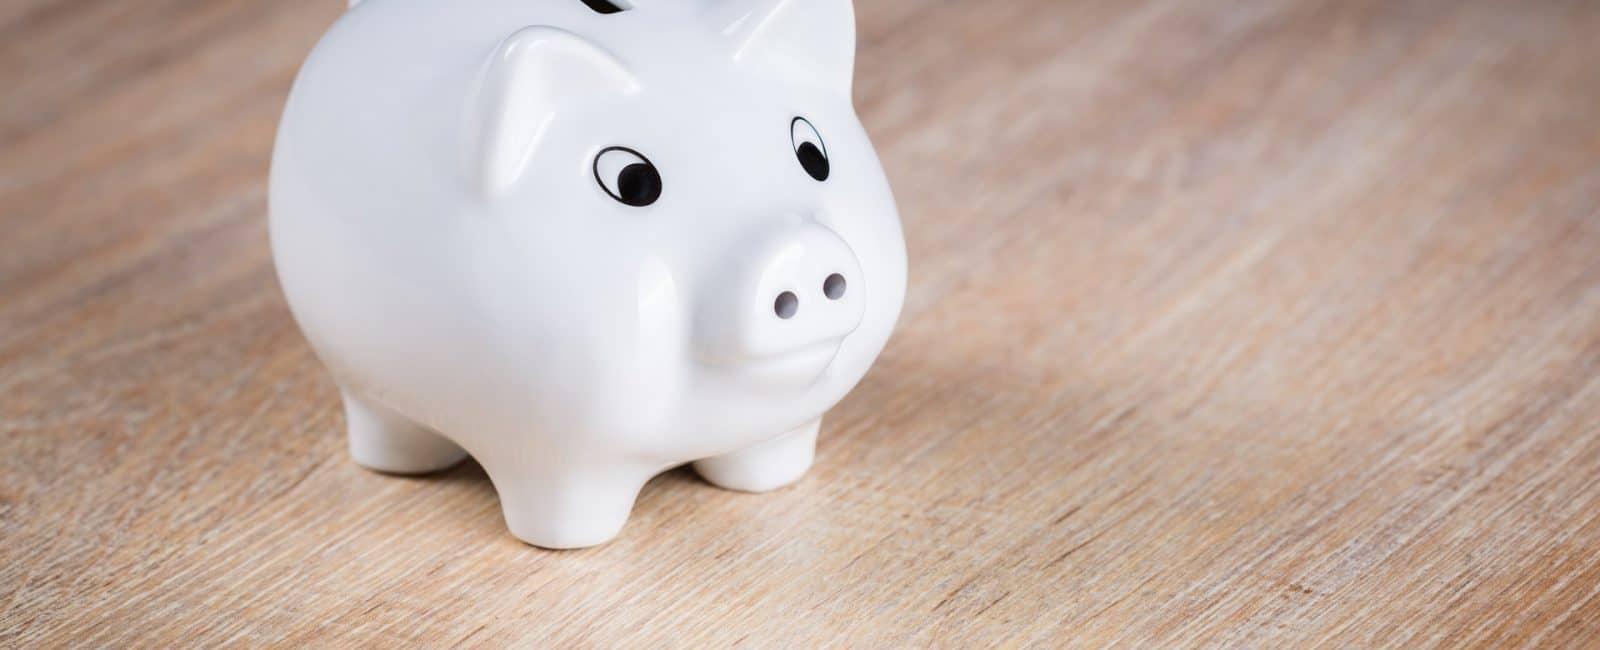 50+ Brilliant Ways To Save Money – Part 1